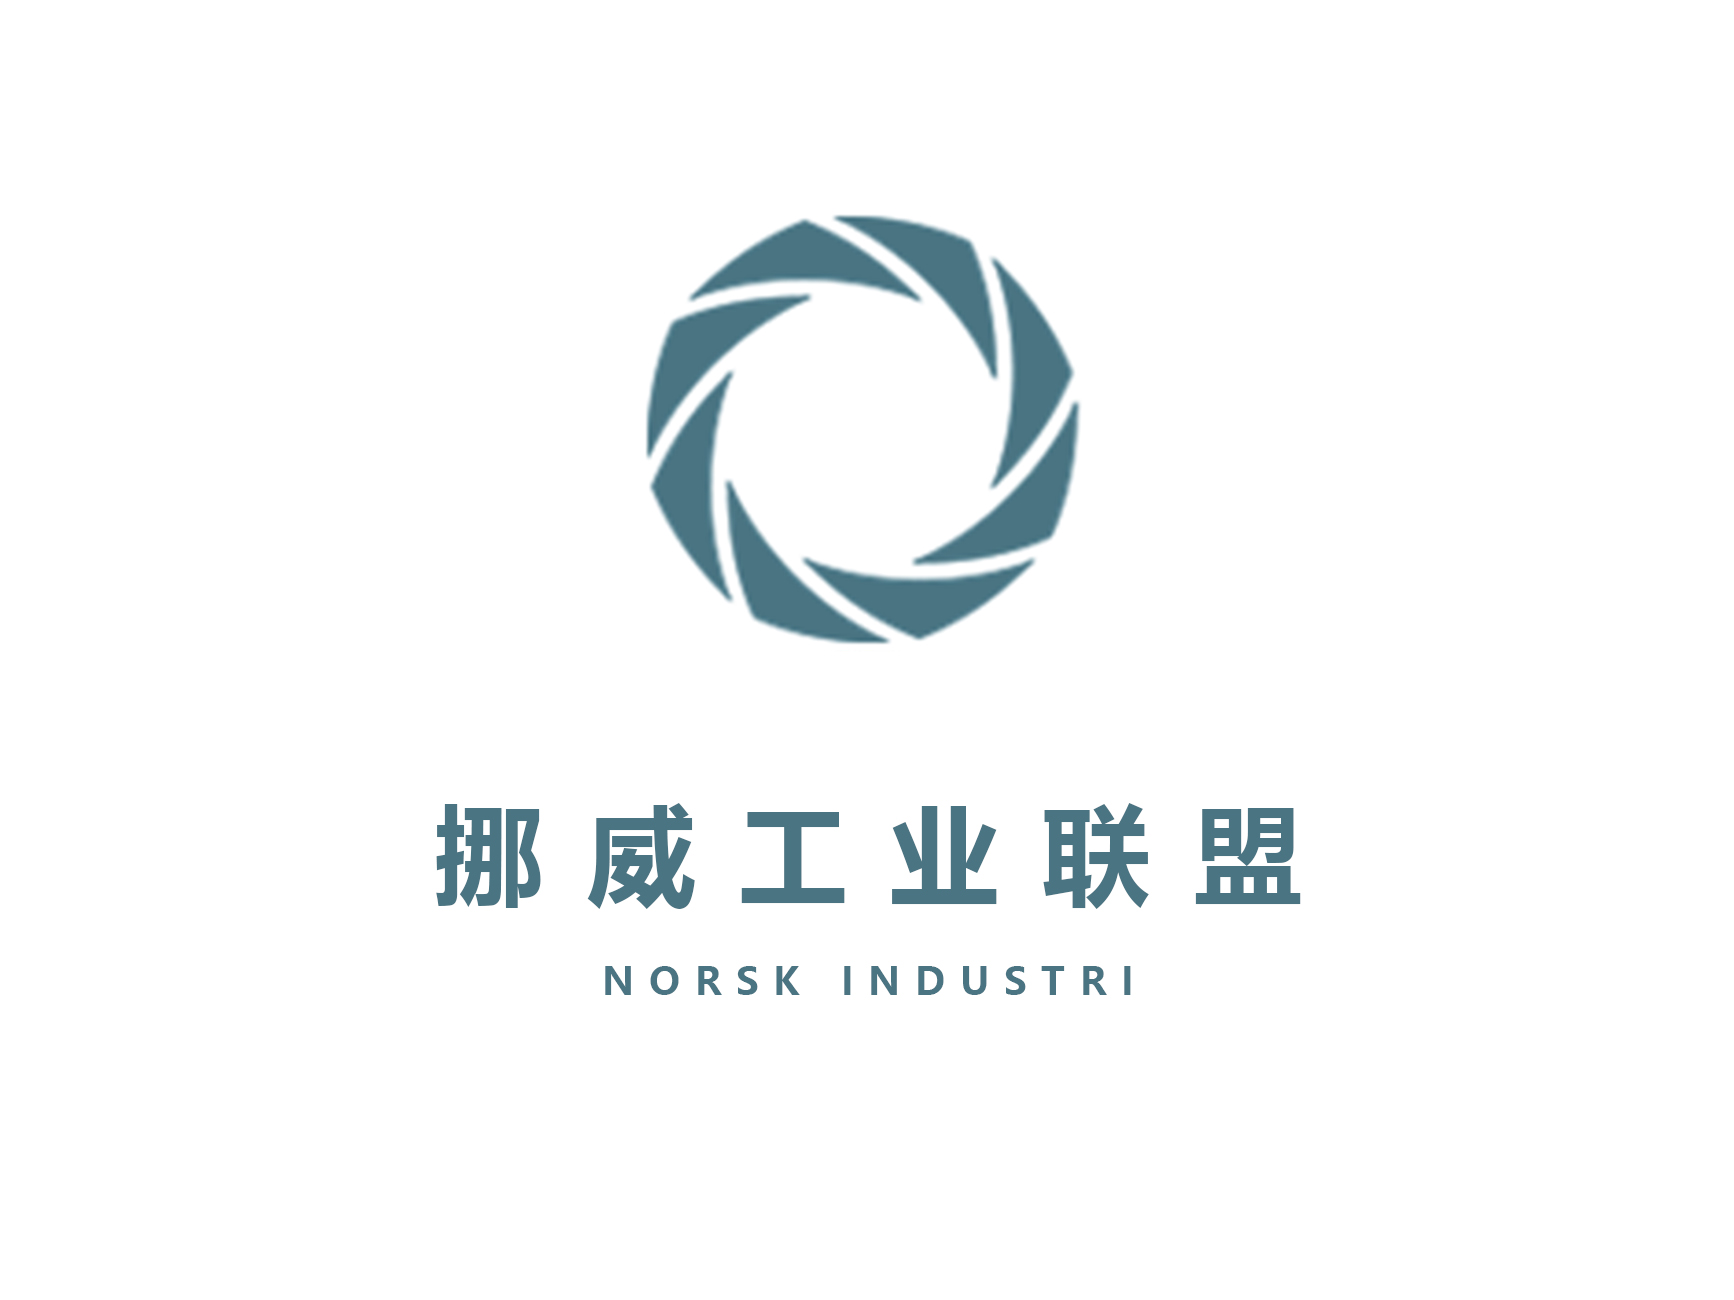 挪威工业联盟/Norsk Industri